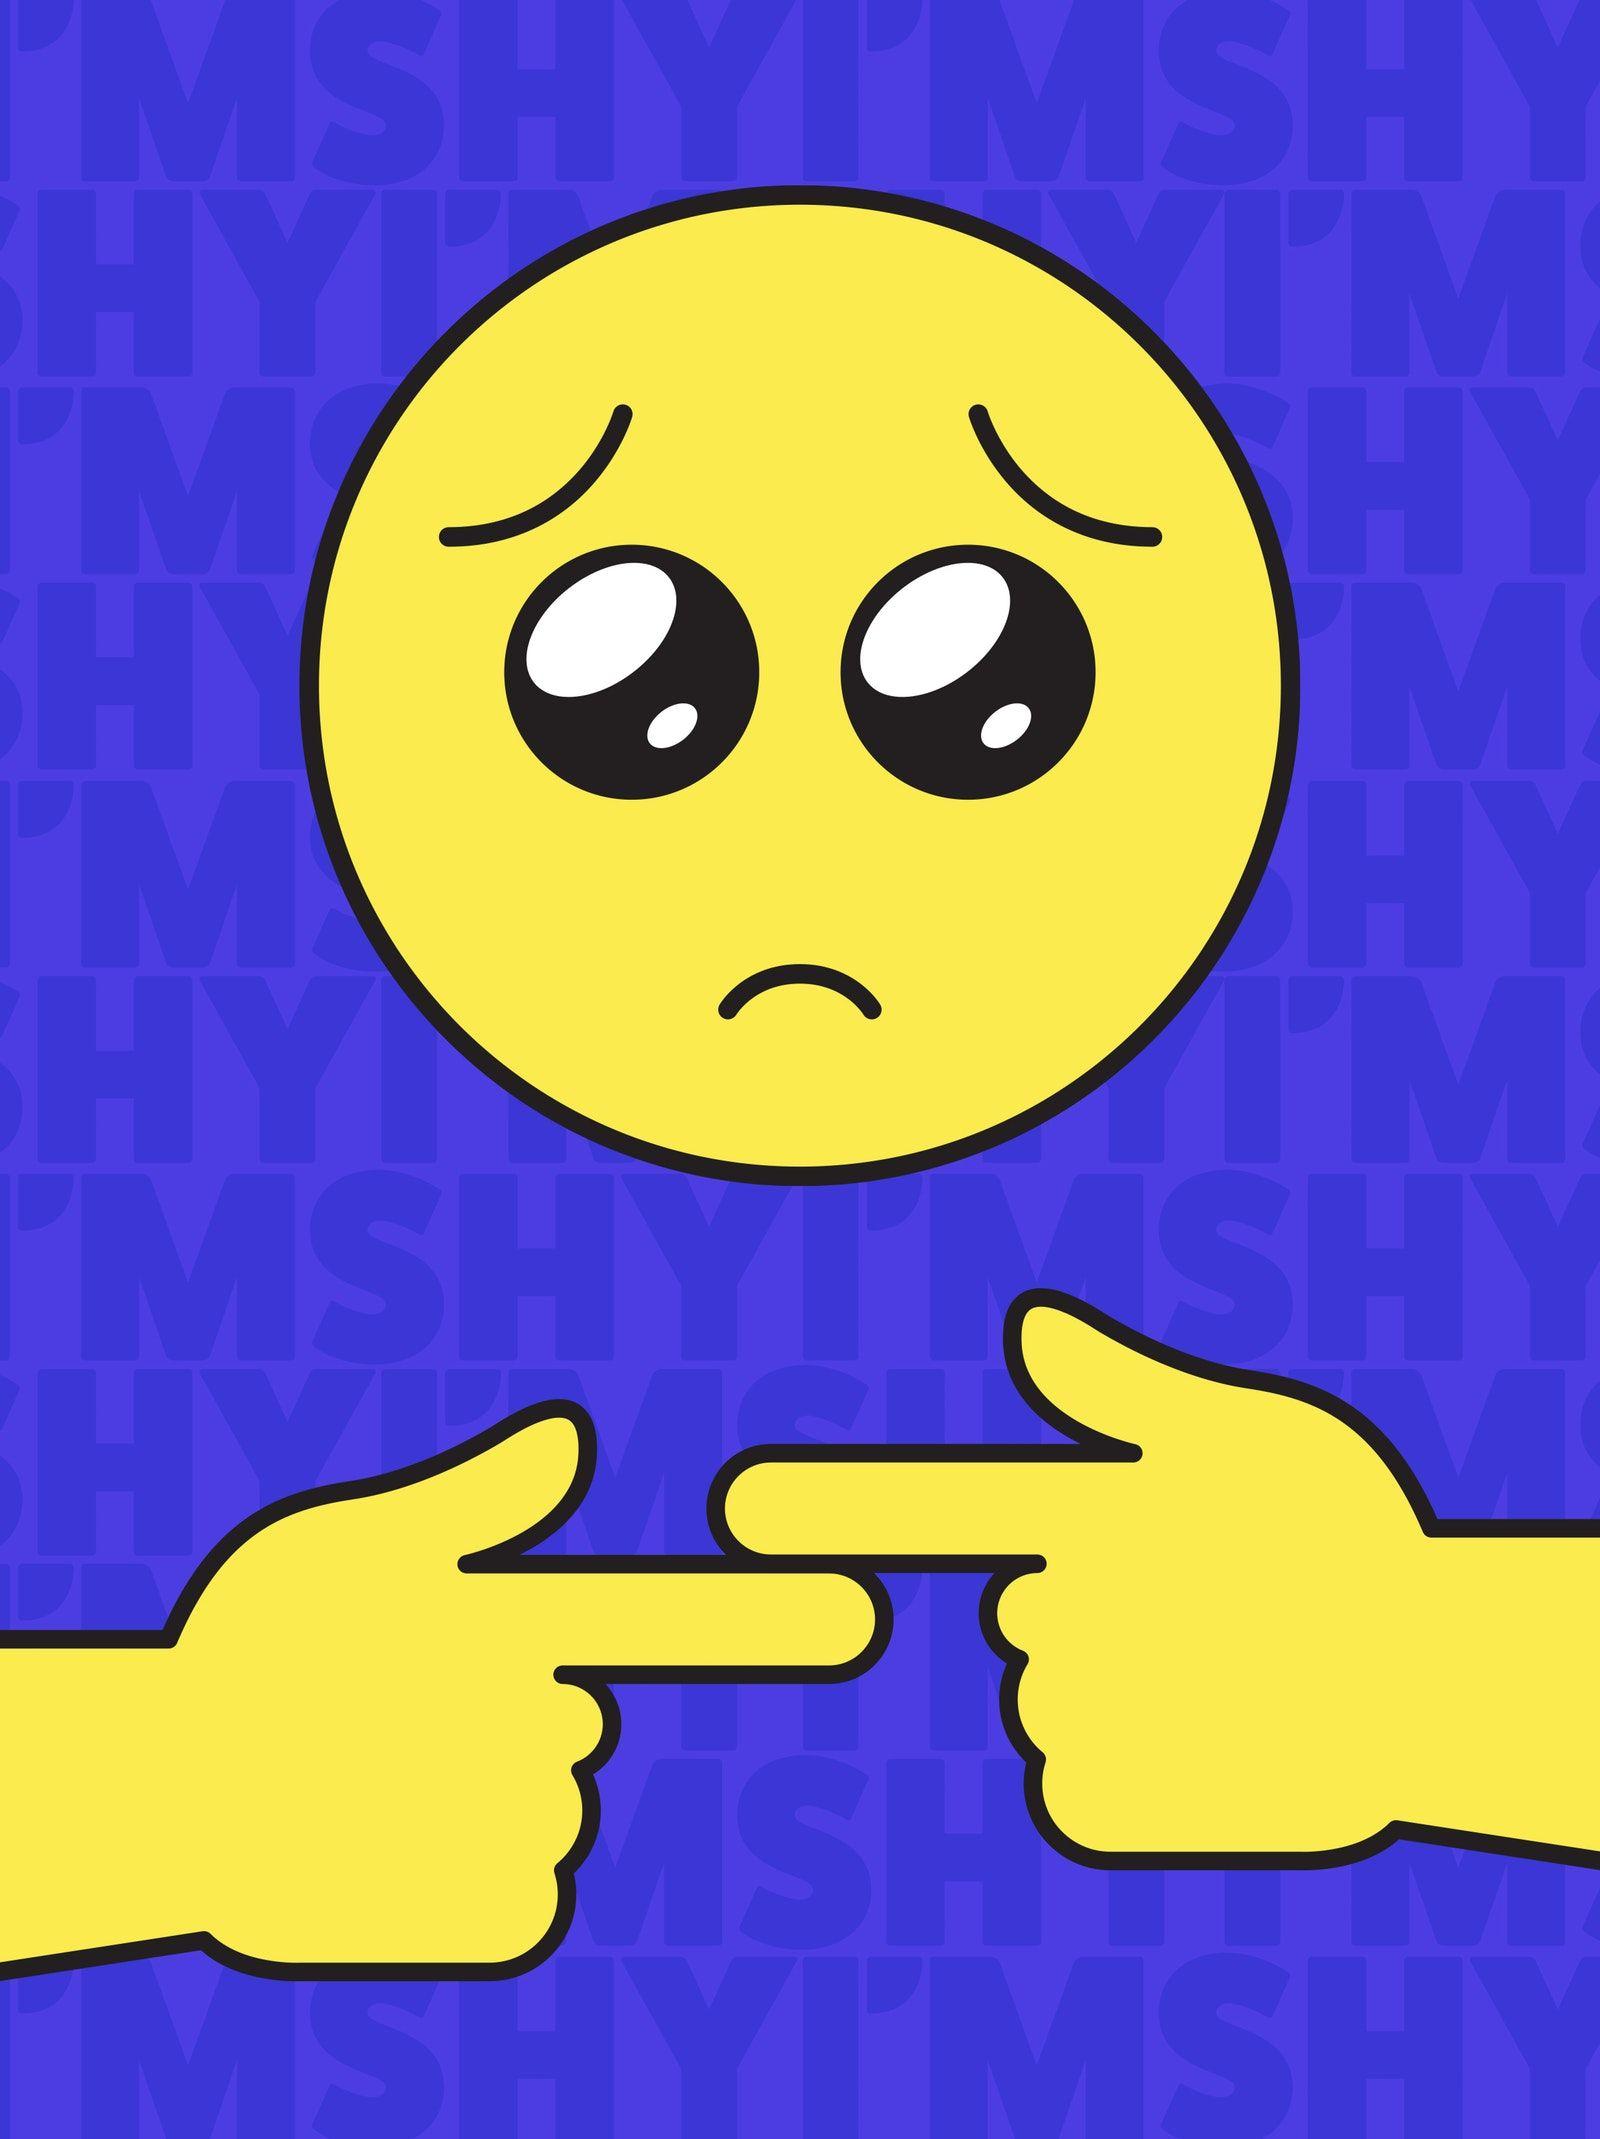 I Love Tiktok Butimshy How Tiktok Gave These Emojis New Meaning Emoji Combinations Art In The Age Emoji